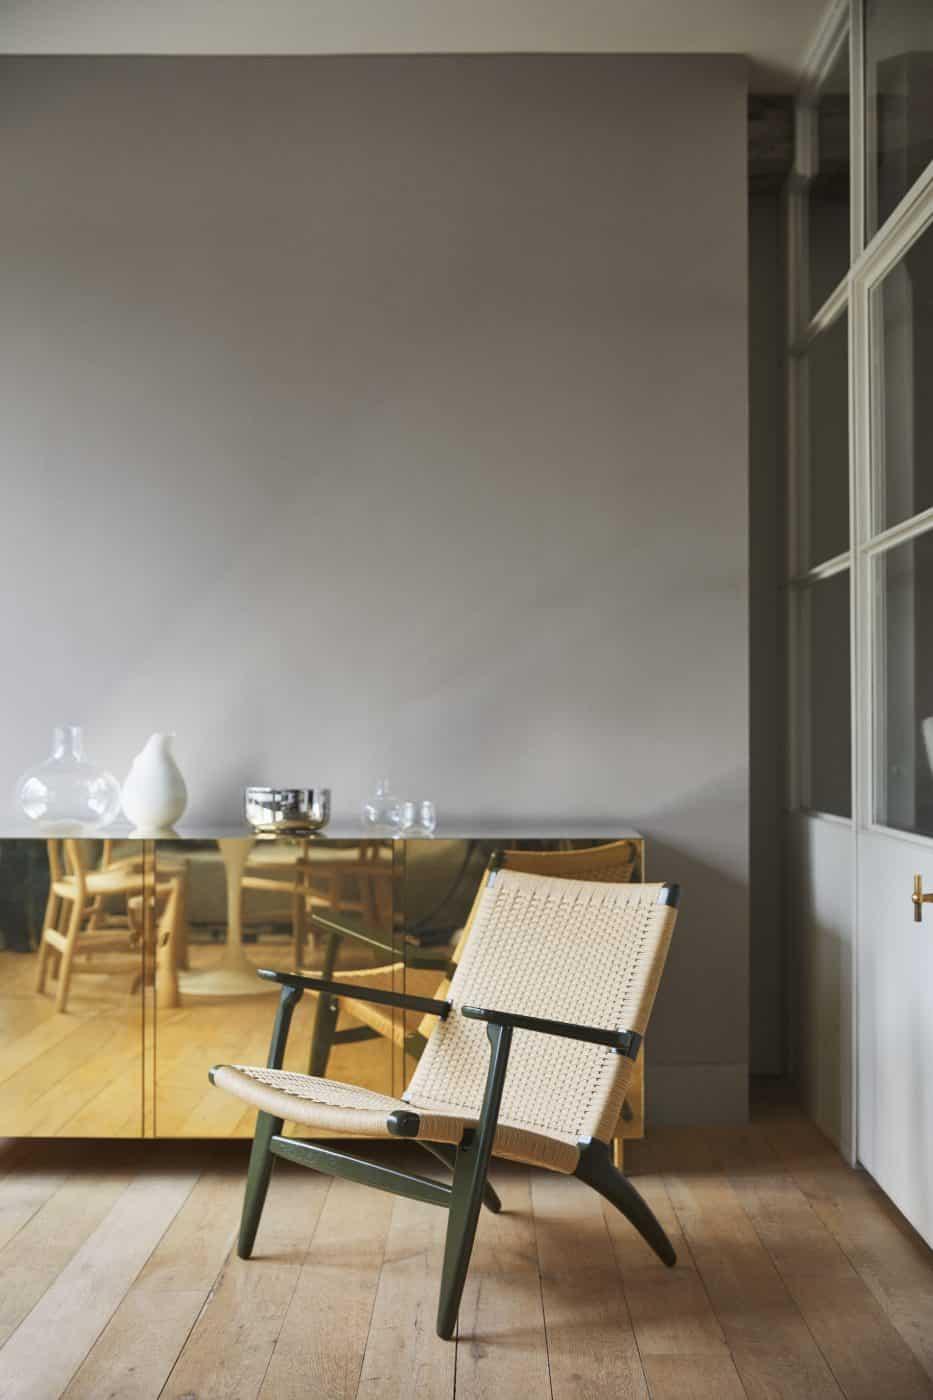 C25 armchair in Seaweed green by Hans J. Wegner and Ilse Crawford